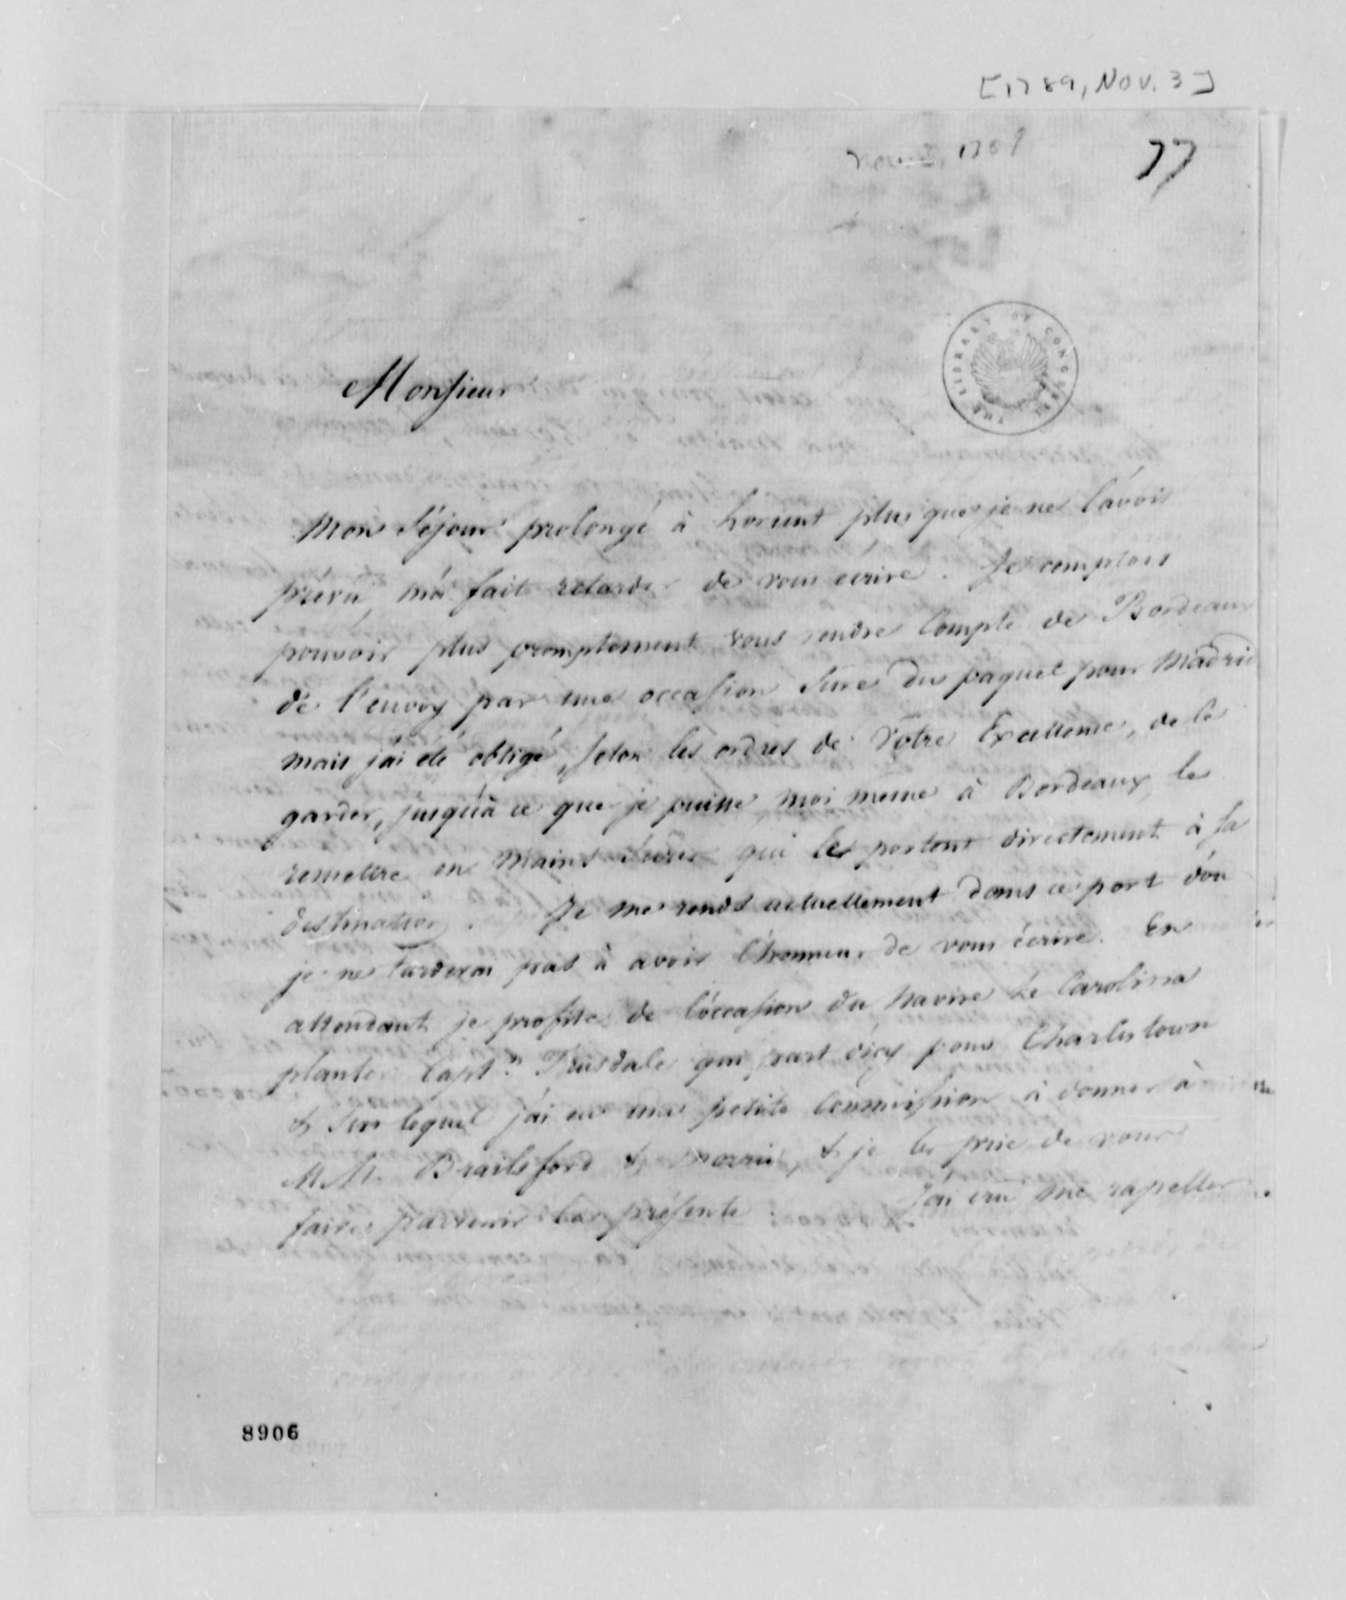 Jacob Vernes to Thomas Jefferson, November 3, 1789, in French